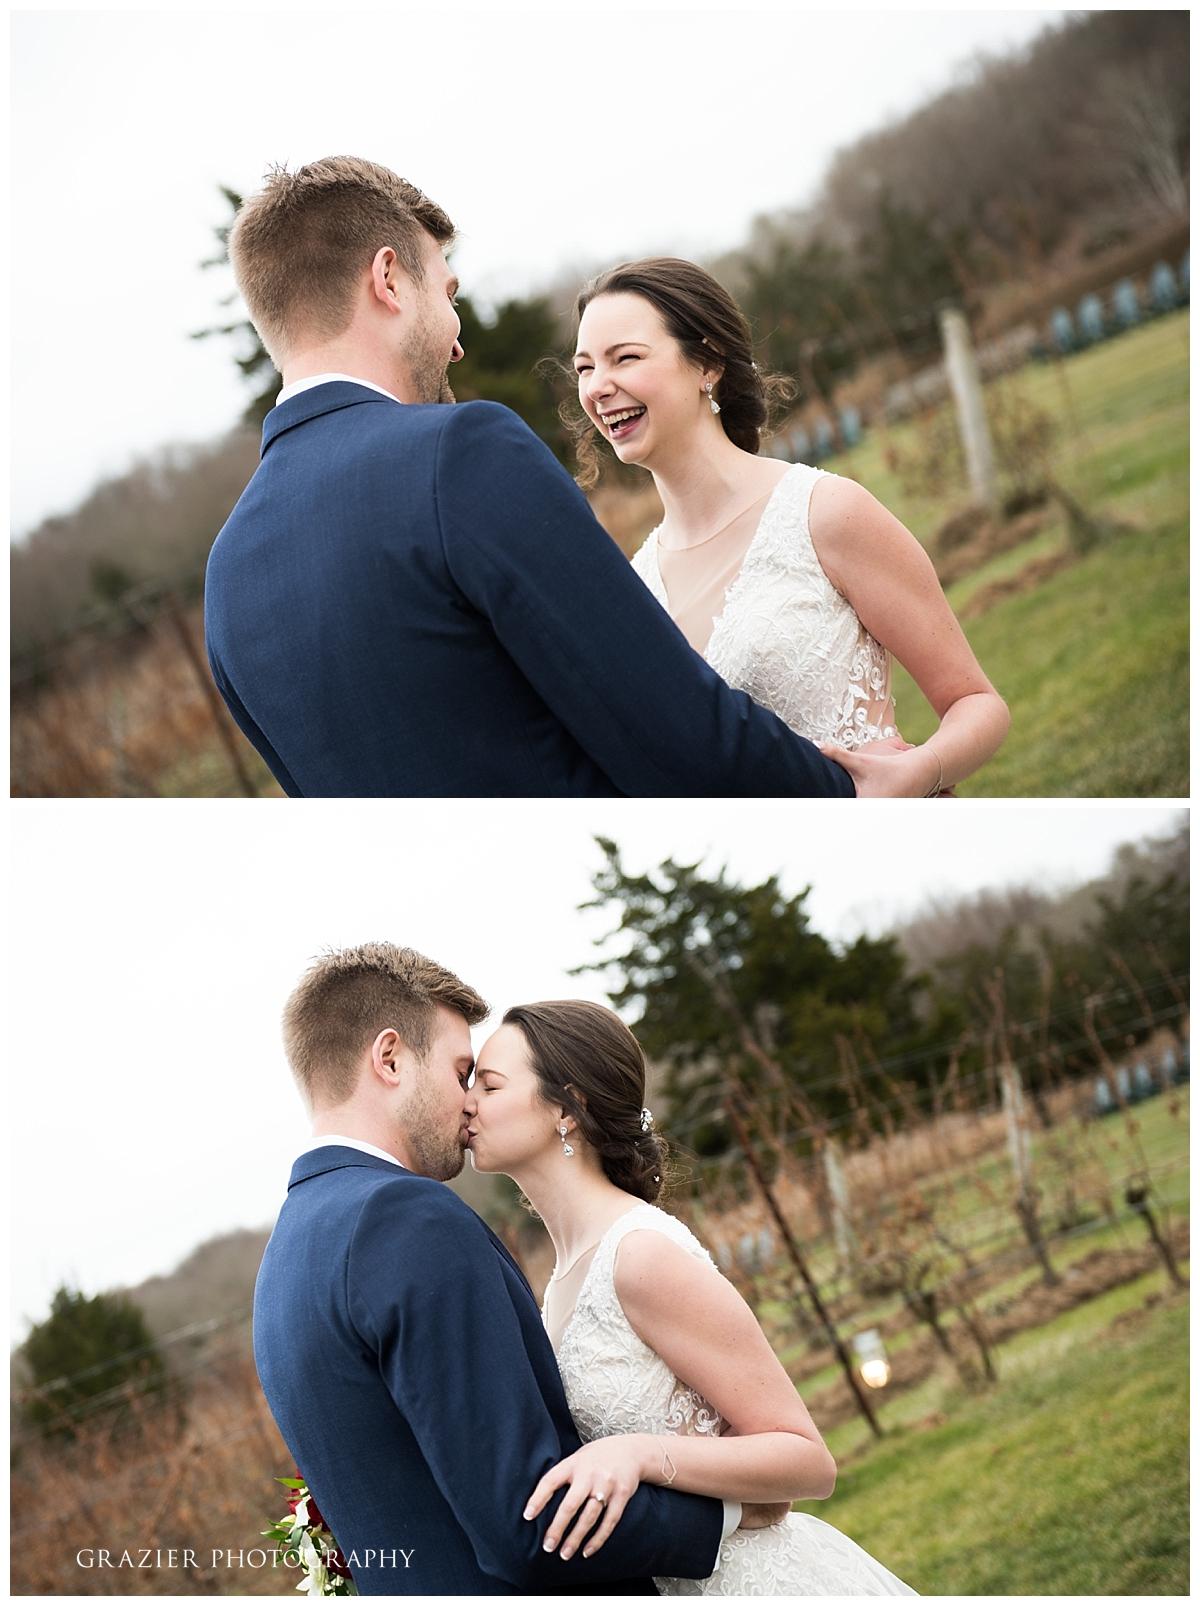 Saltwater Farm Vineyard Wedding Grazier Photography 1222-17-22_WEB.jpg